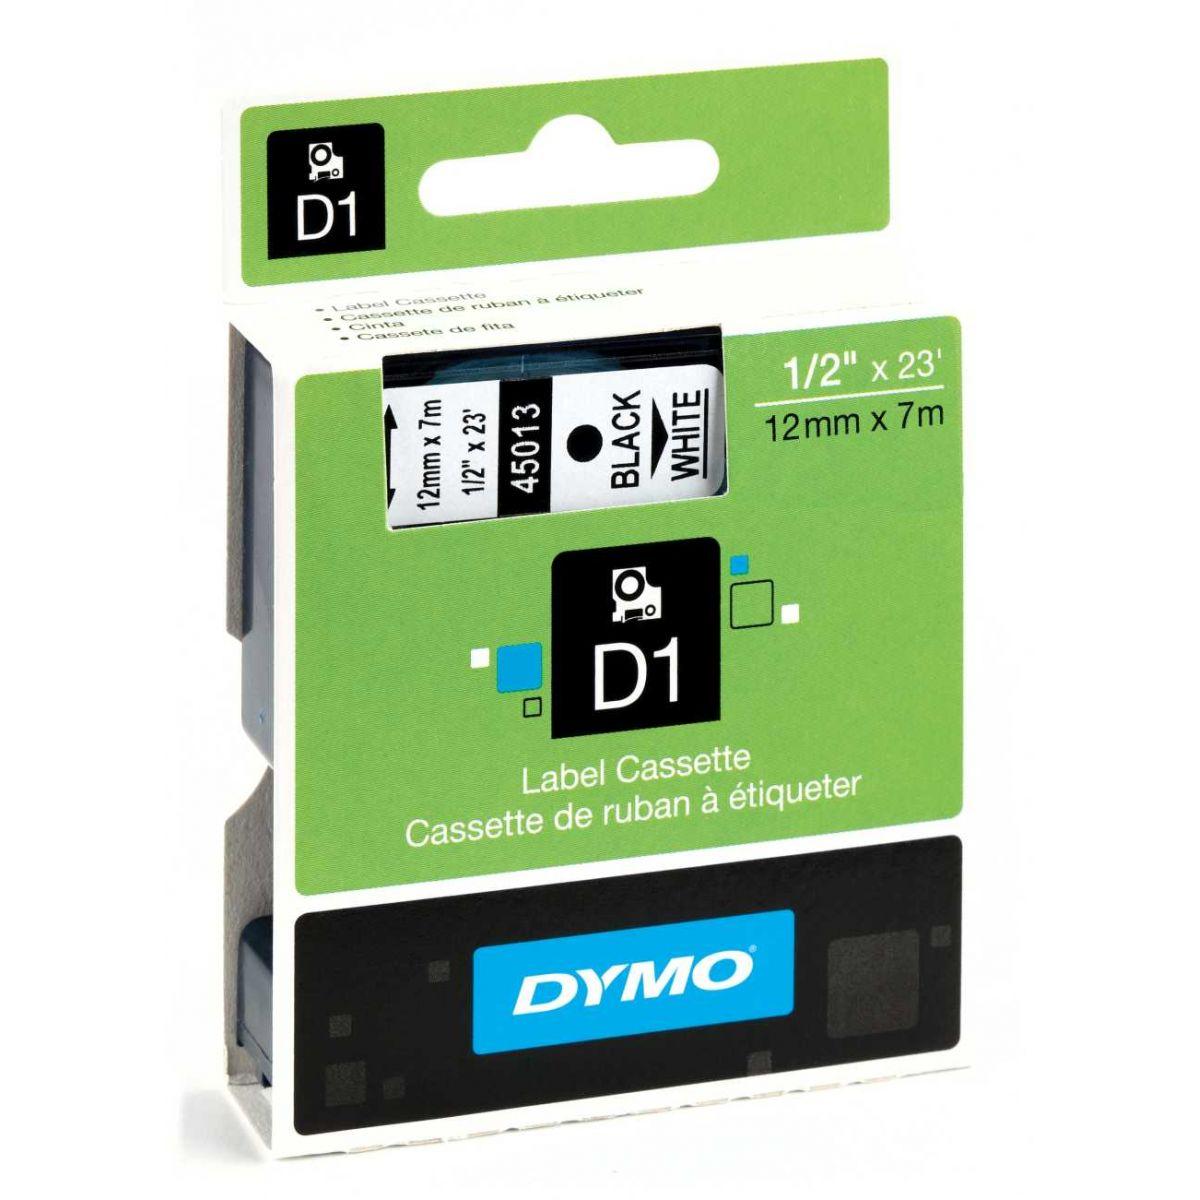 Fita para rotulador eletrônico PROFISSIONAL 12mmx7mt PT/BR